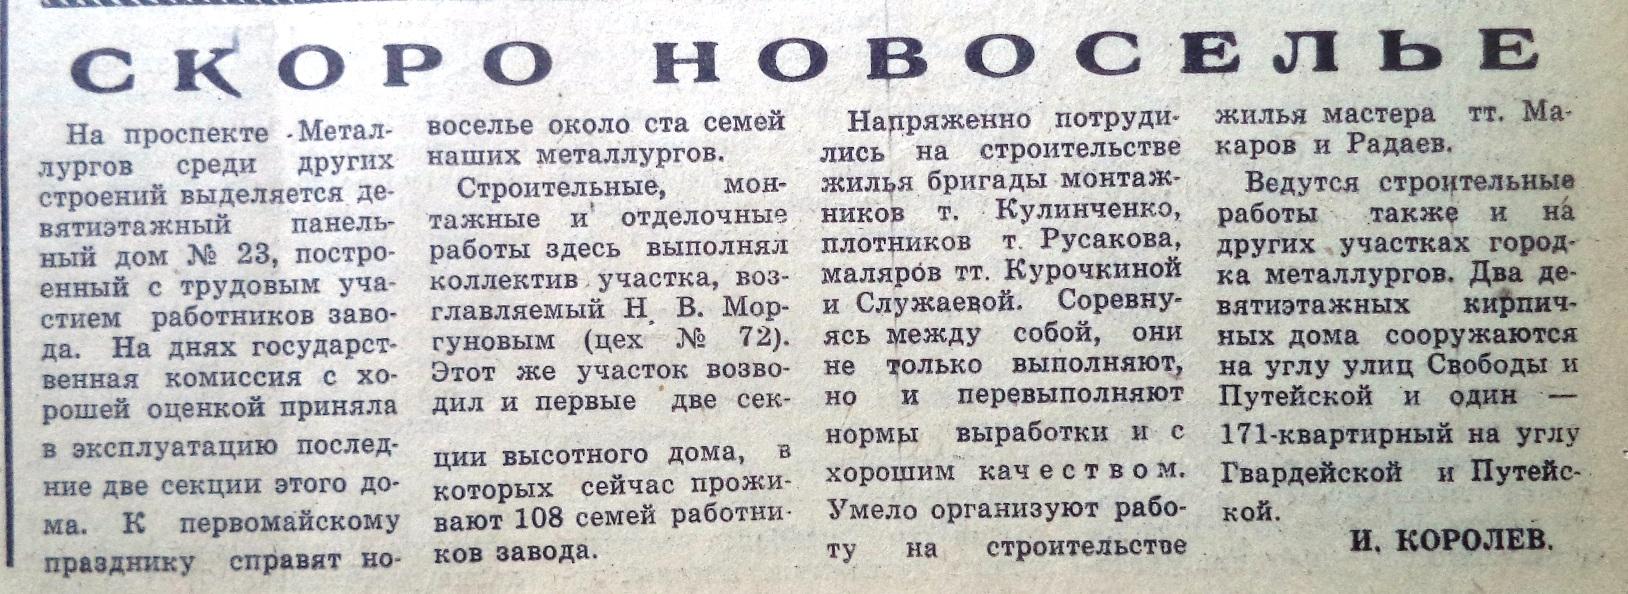 ФОТО-72-Металлургов-Рабочий-1974-9 апреля